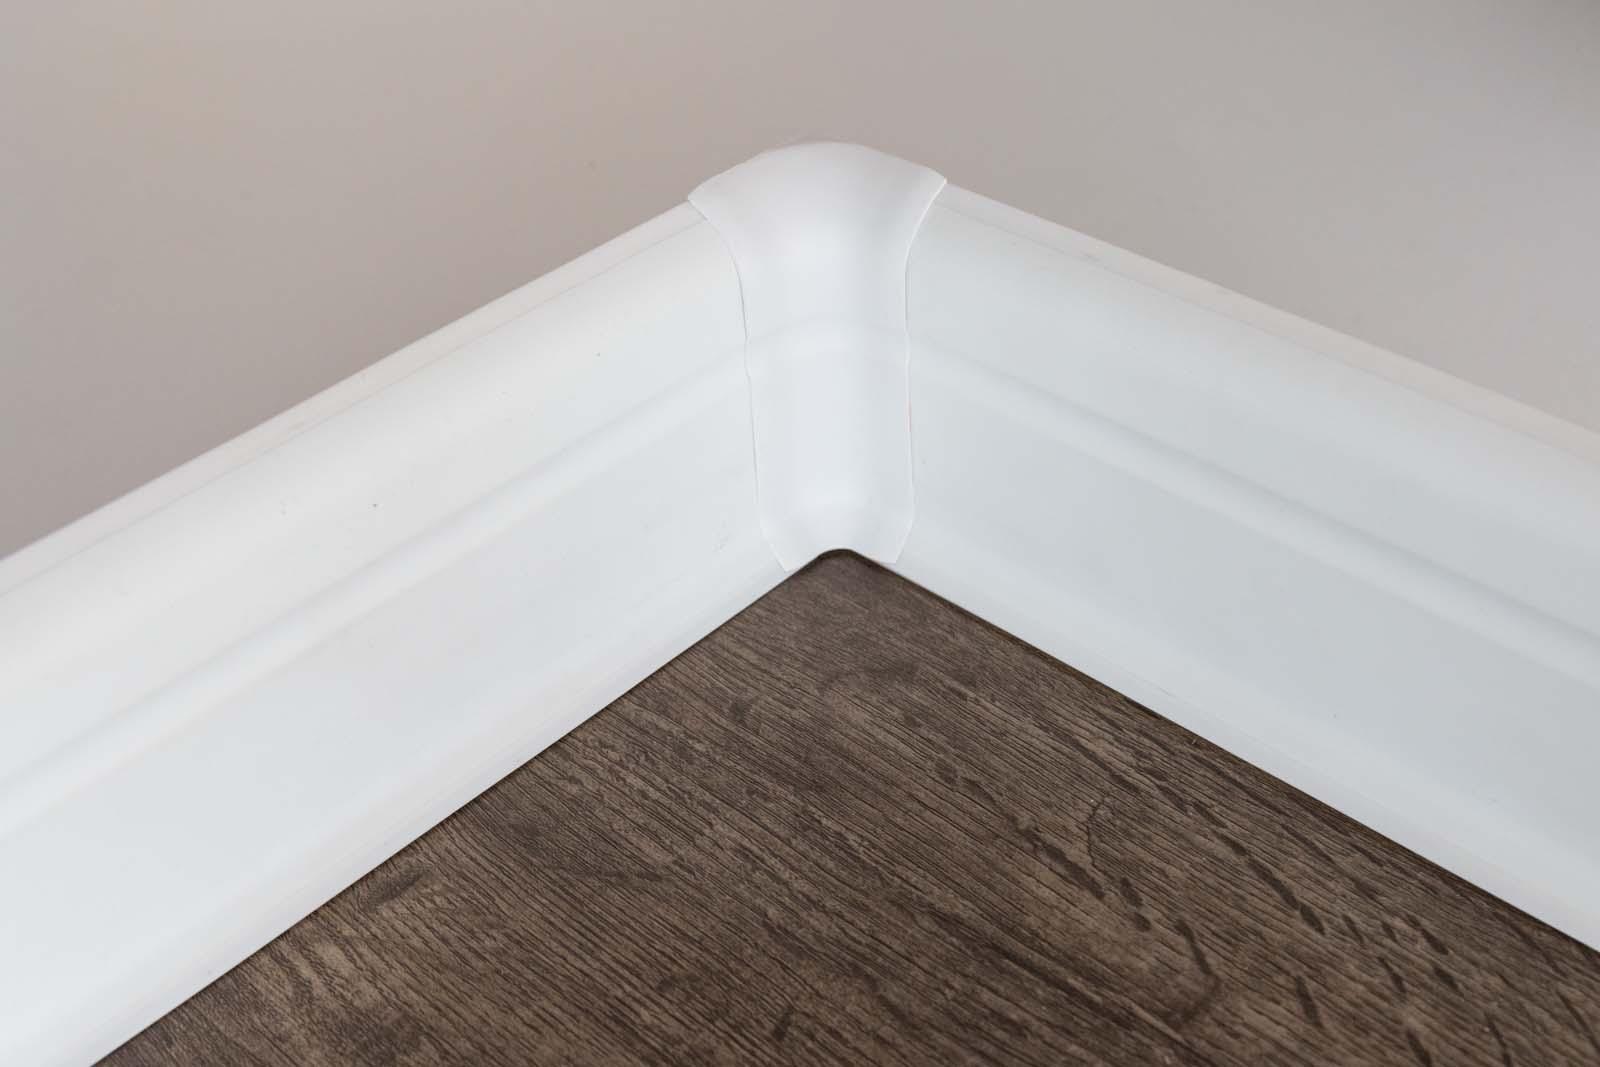 Tarima madera vinilica para interiores sin mantenimiento for Tarima de pvc imitacion madera